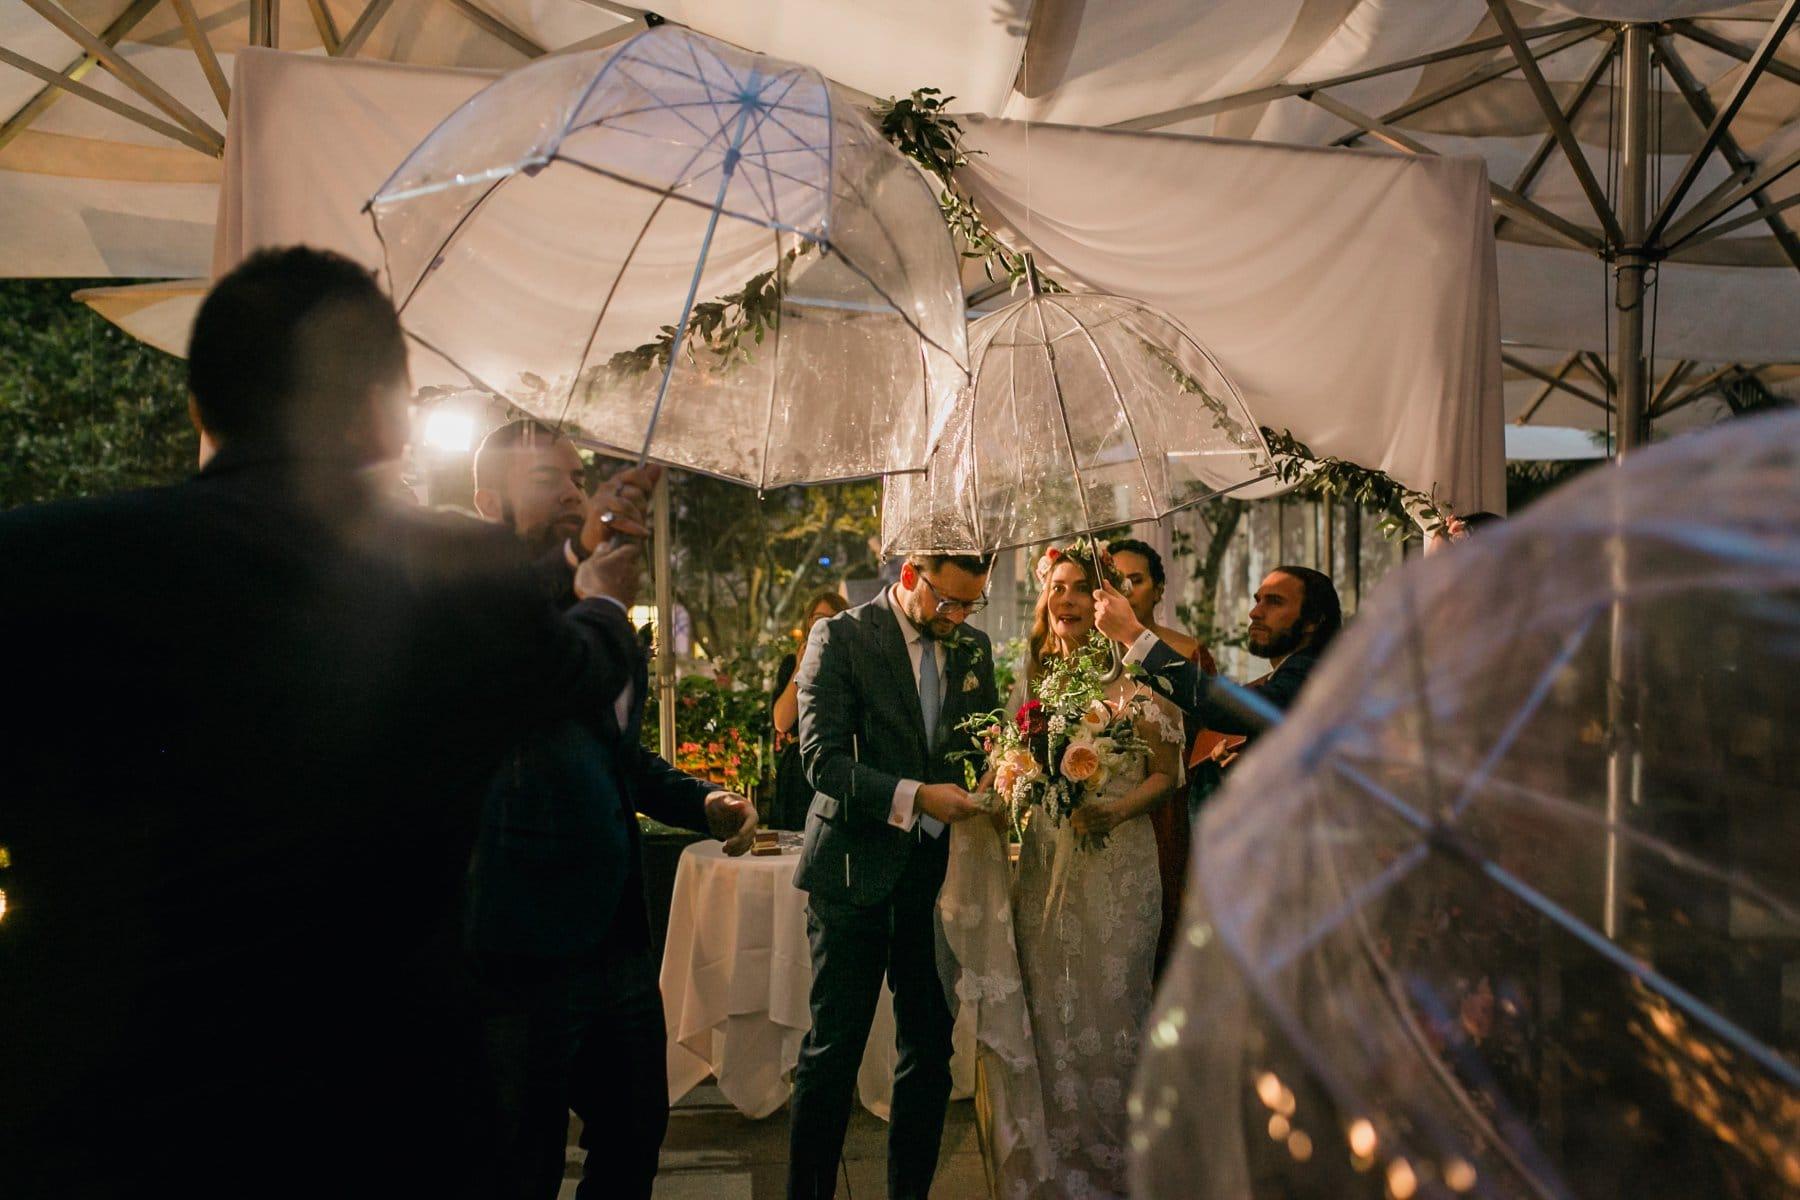 ceremony in the rain at night Bryant Park wedding ceremony New York City